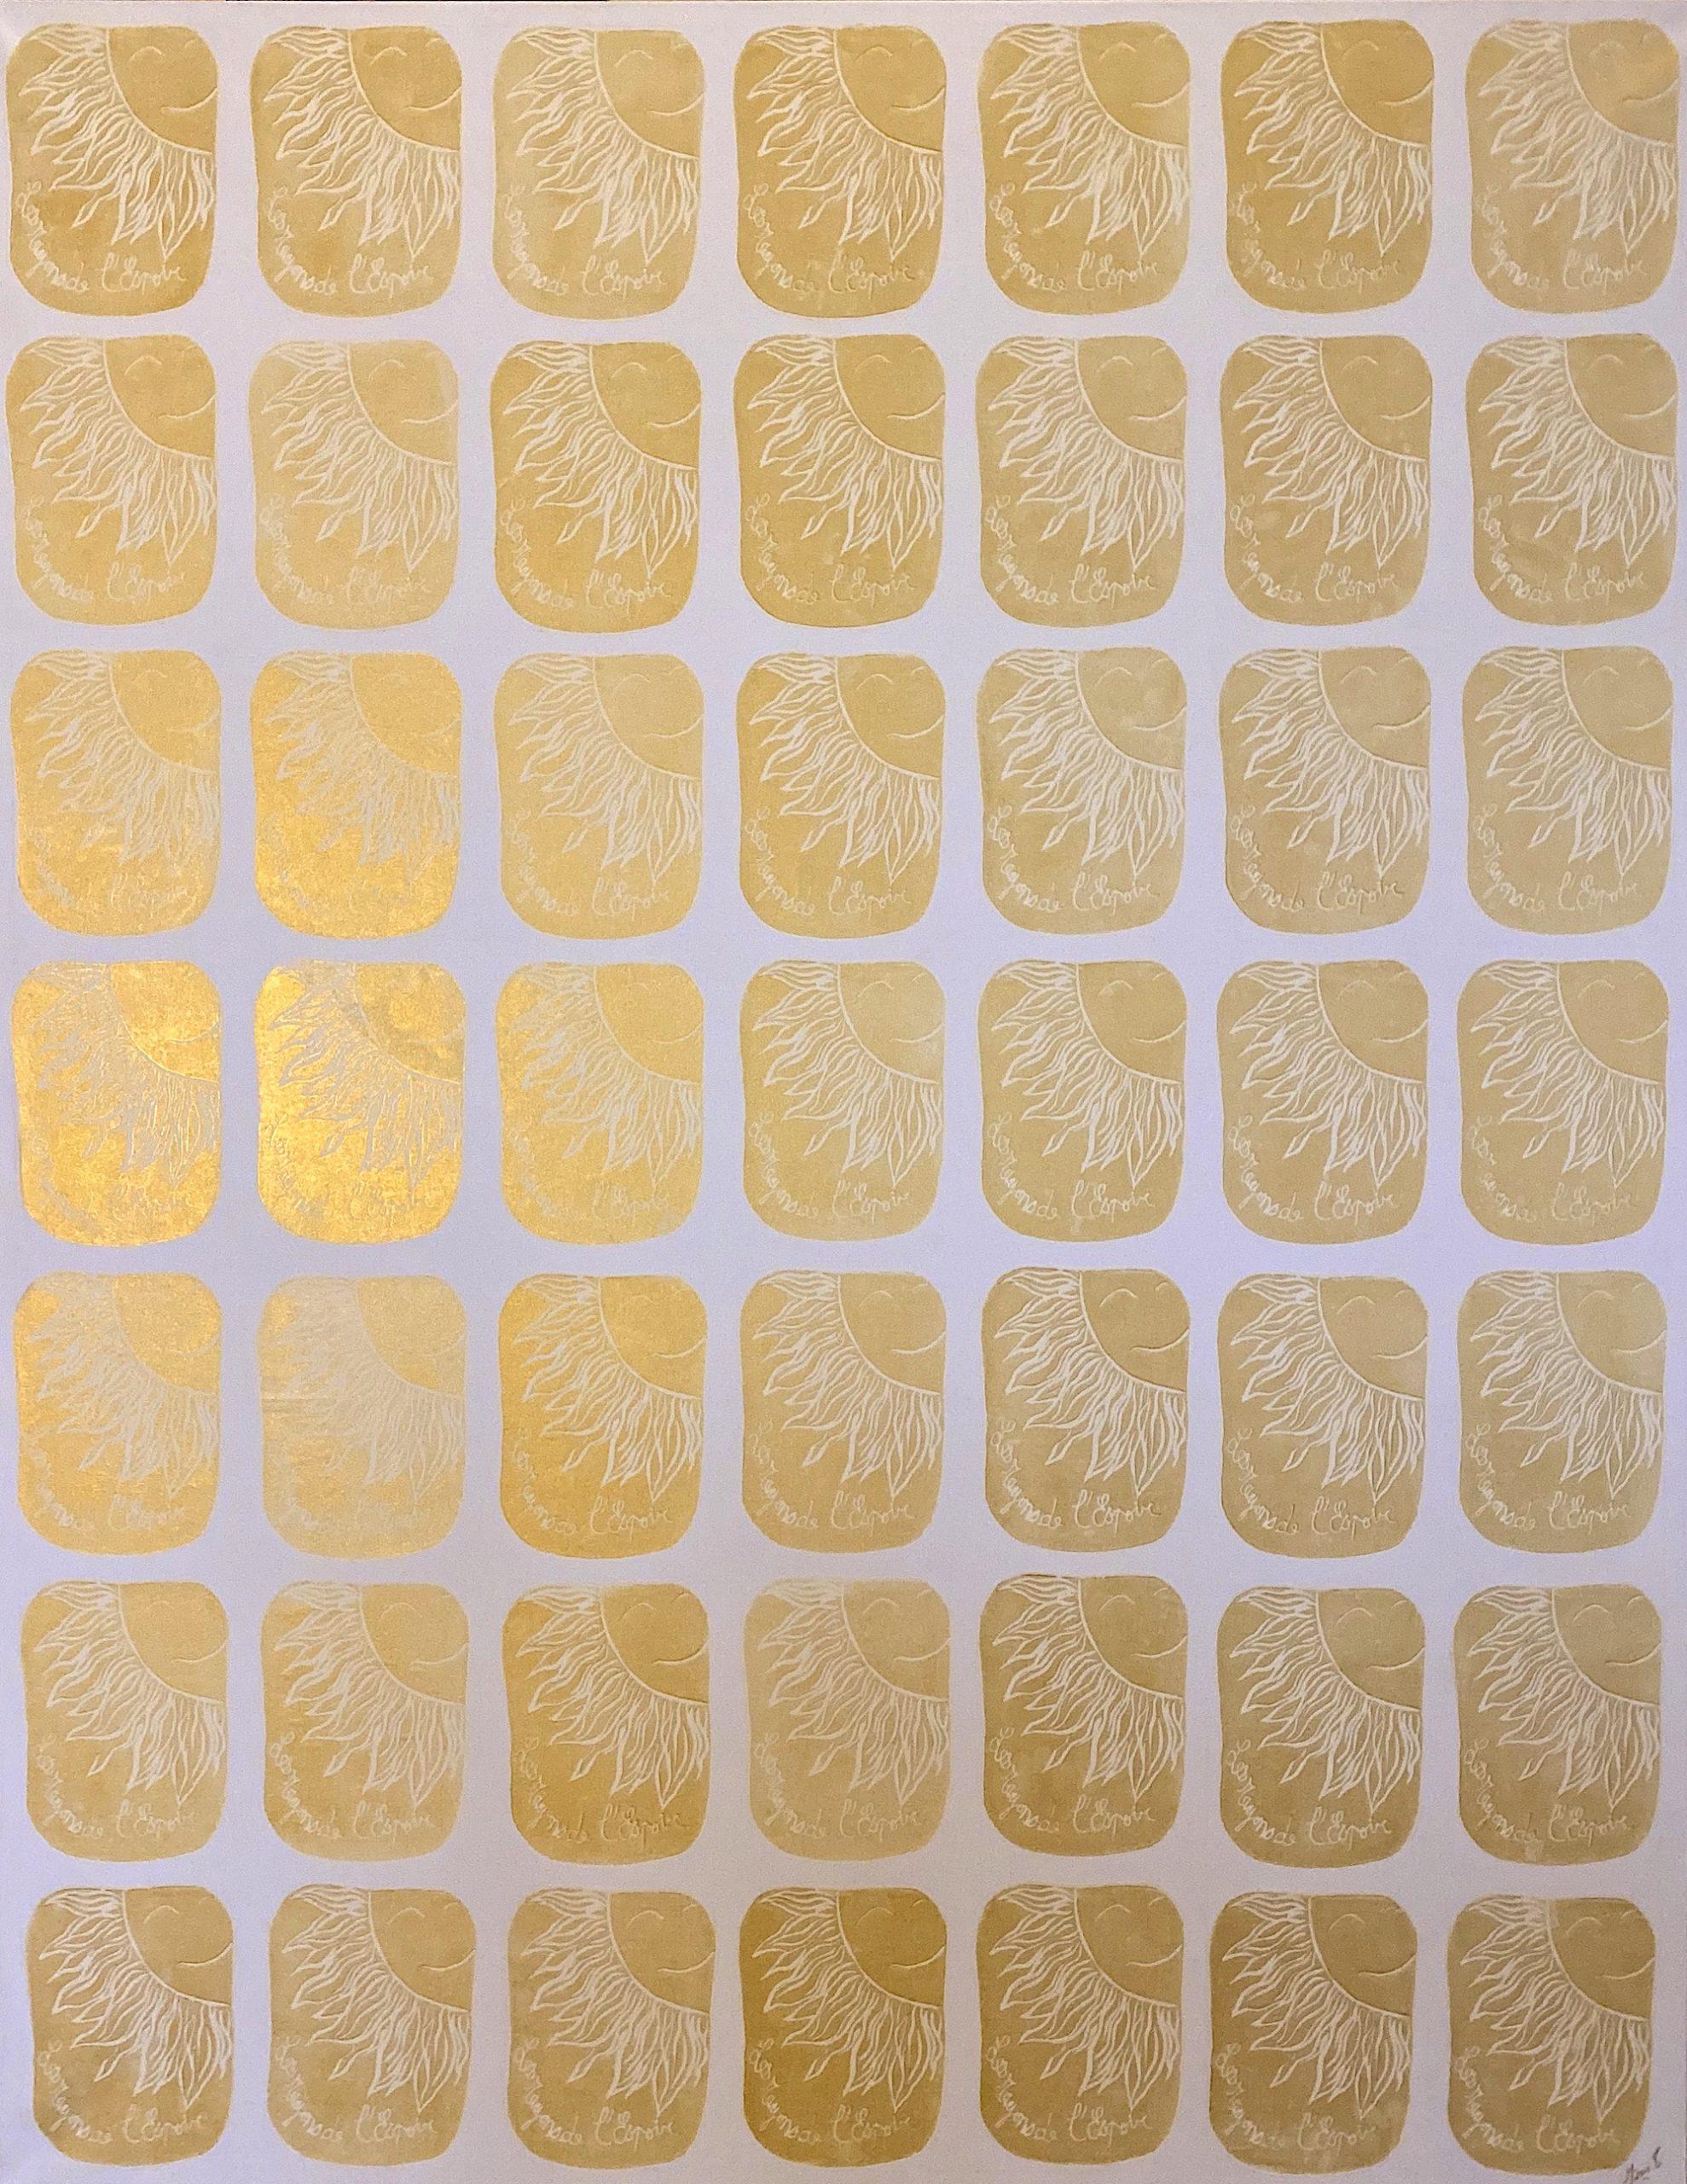 MAMI / Images et Poésie, Paroles  ( 146 Xx 114 cm )